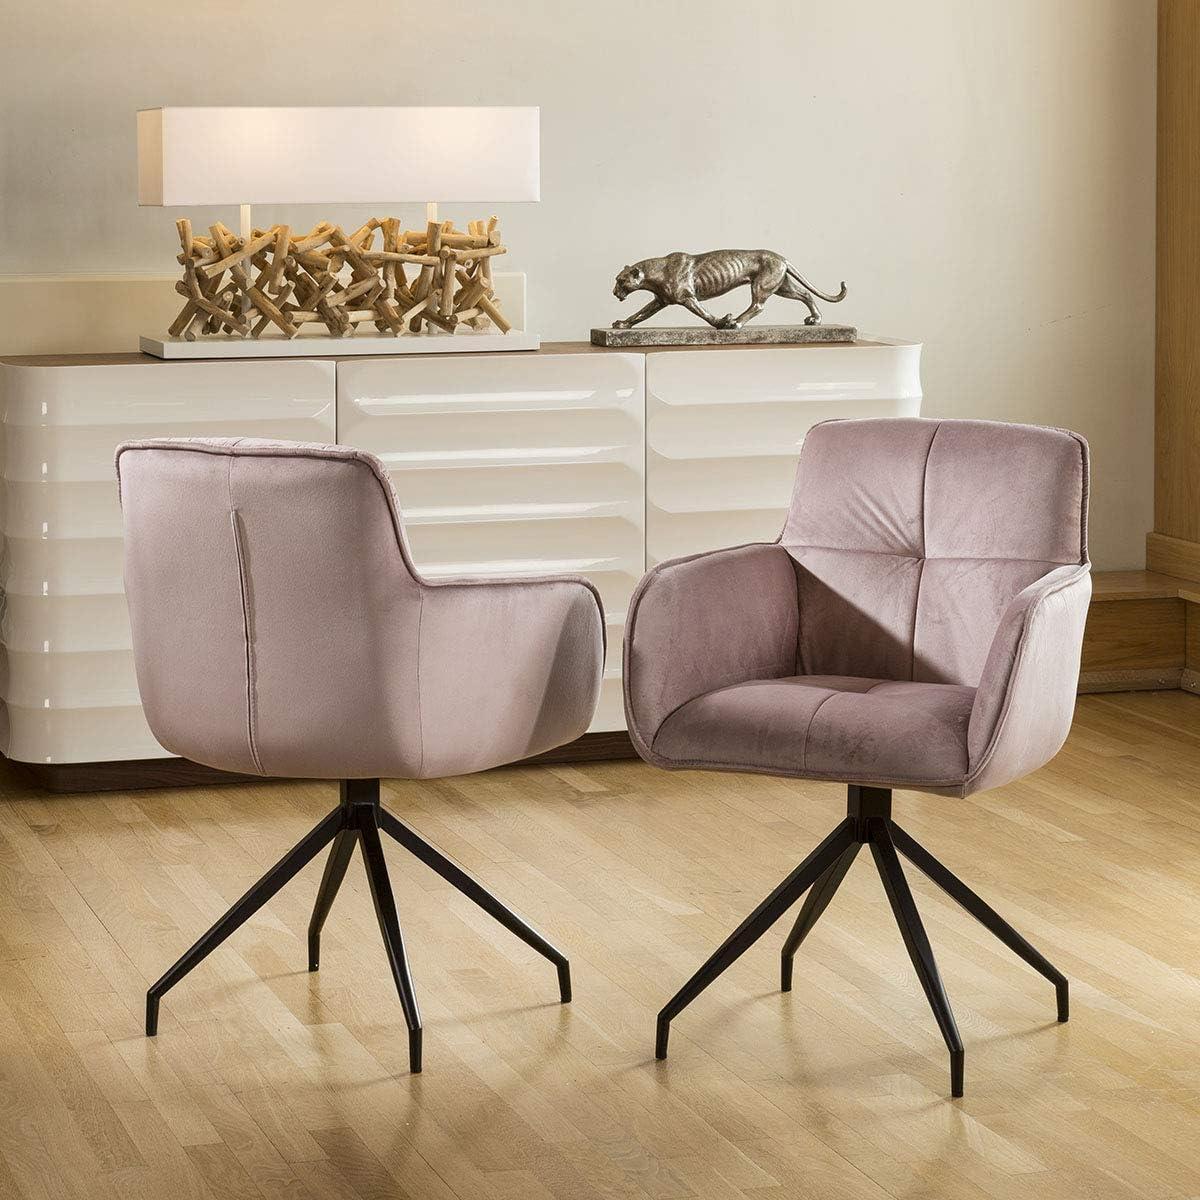 Avant Garde Set Of 2 Super Comfy Velvet 360 Swivel Dining Carver Chairs Dusky Pink Amazon Co Uk Kitchen Home